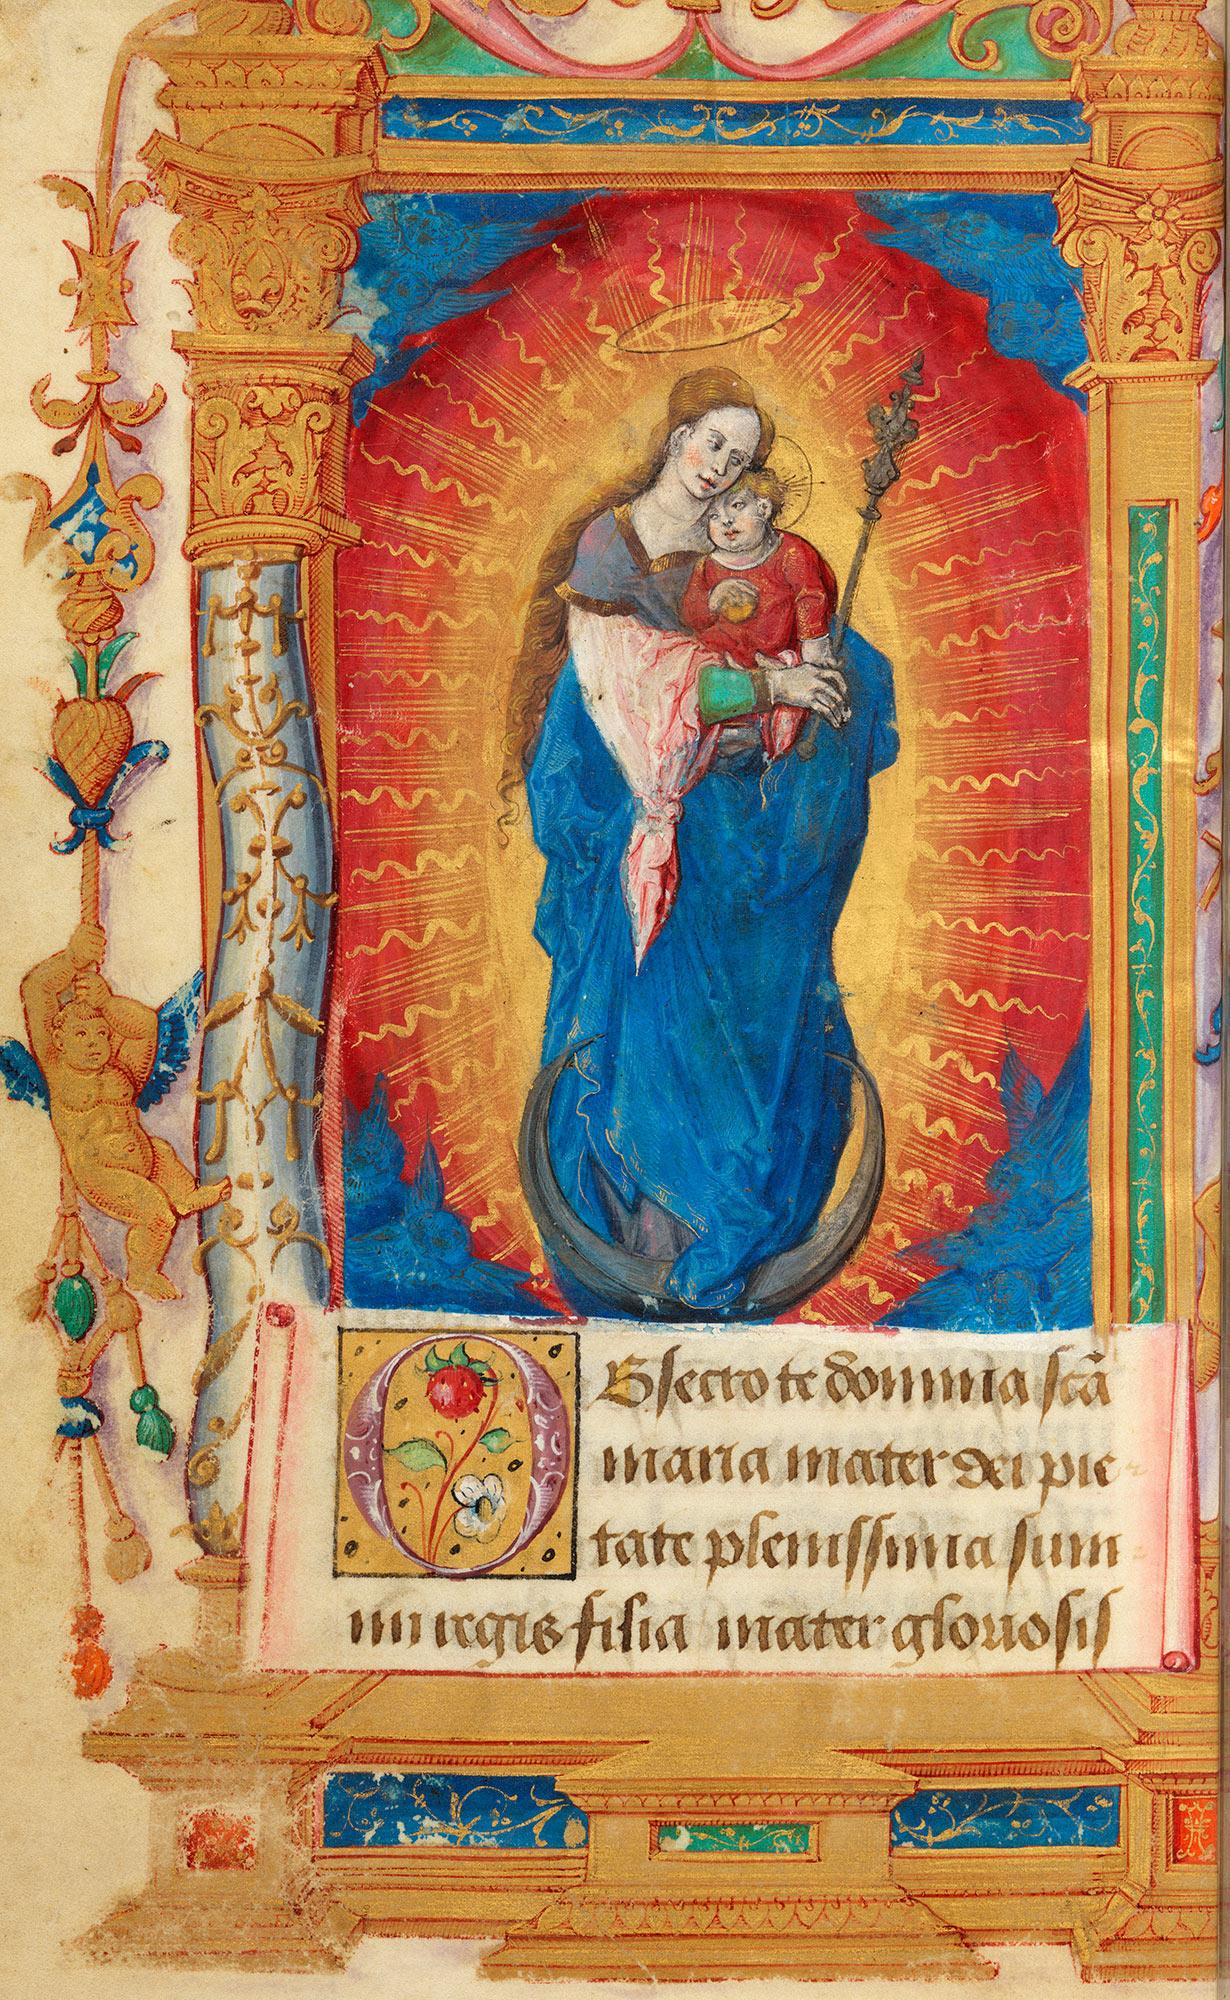 An illuminated manuscript.